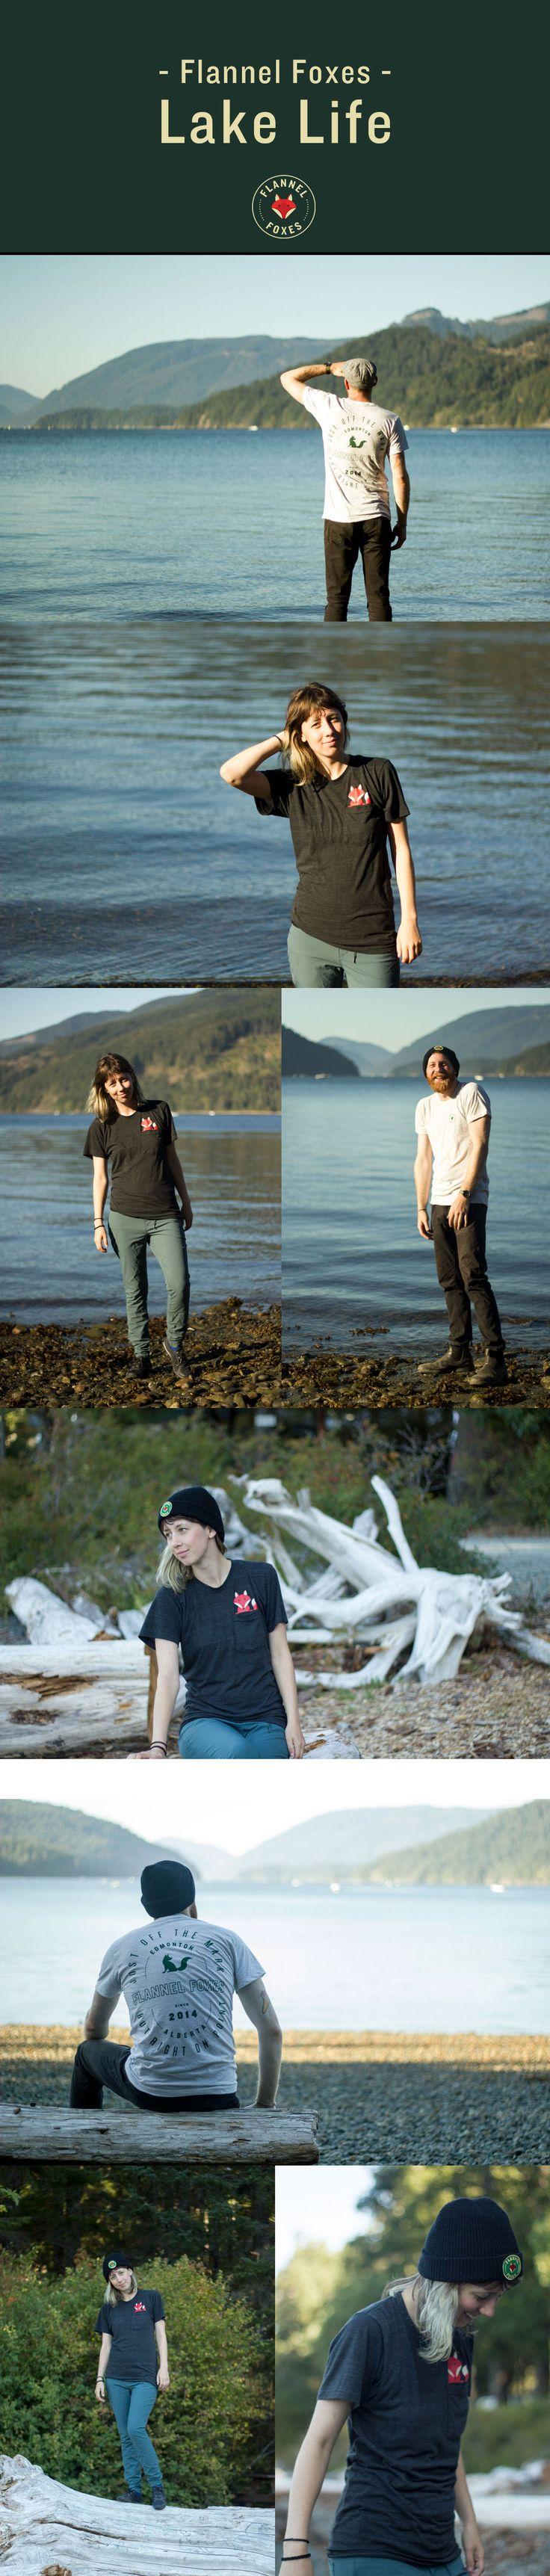 Flannel Foxes Unisex Clothing Line // Lake Life // Explore British Columbia